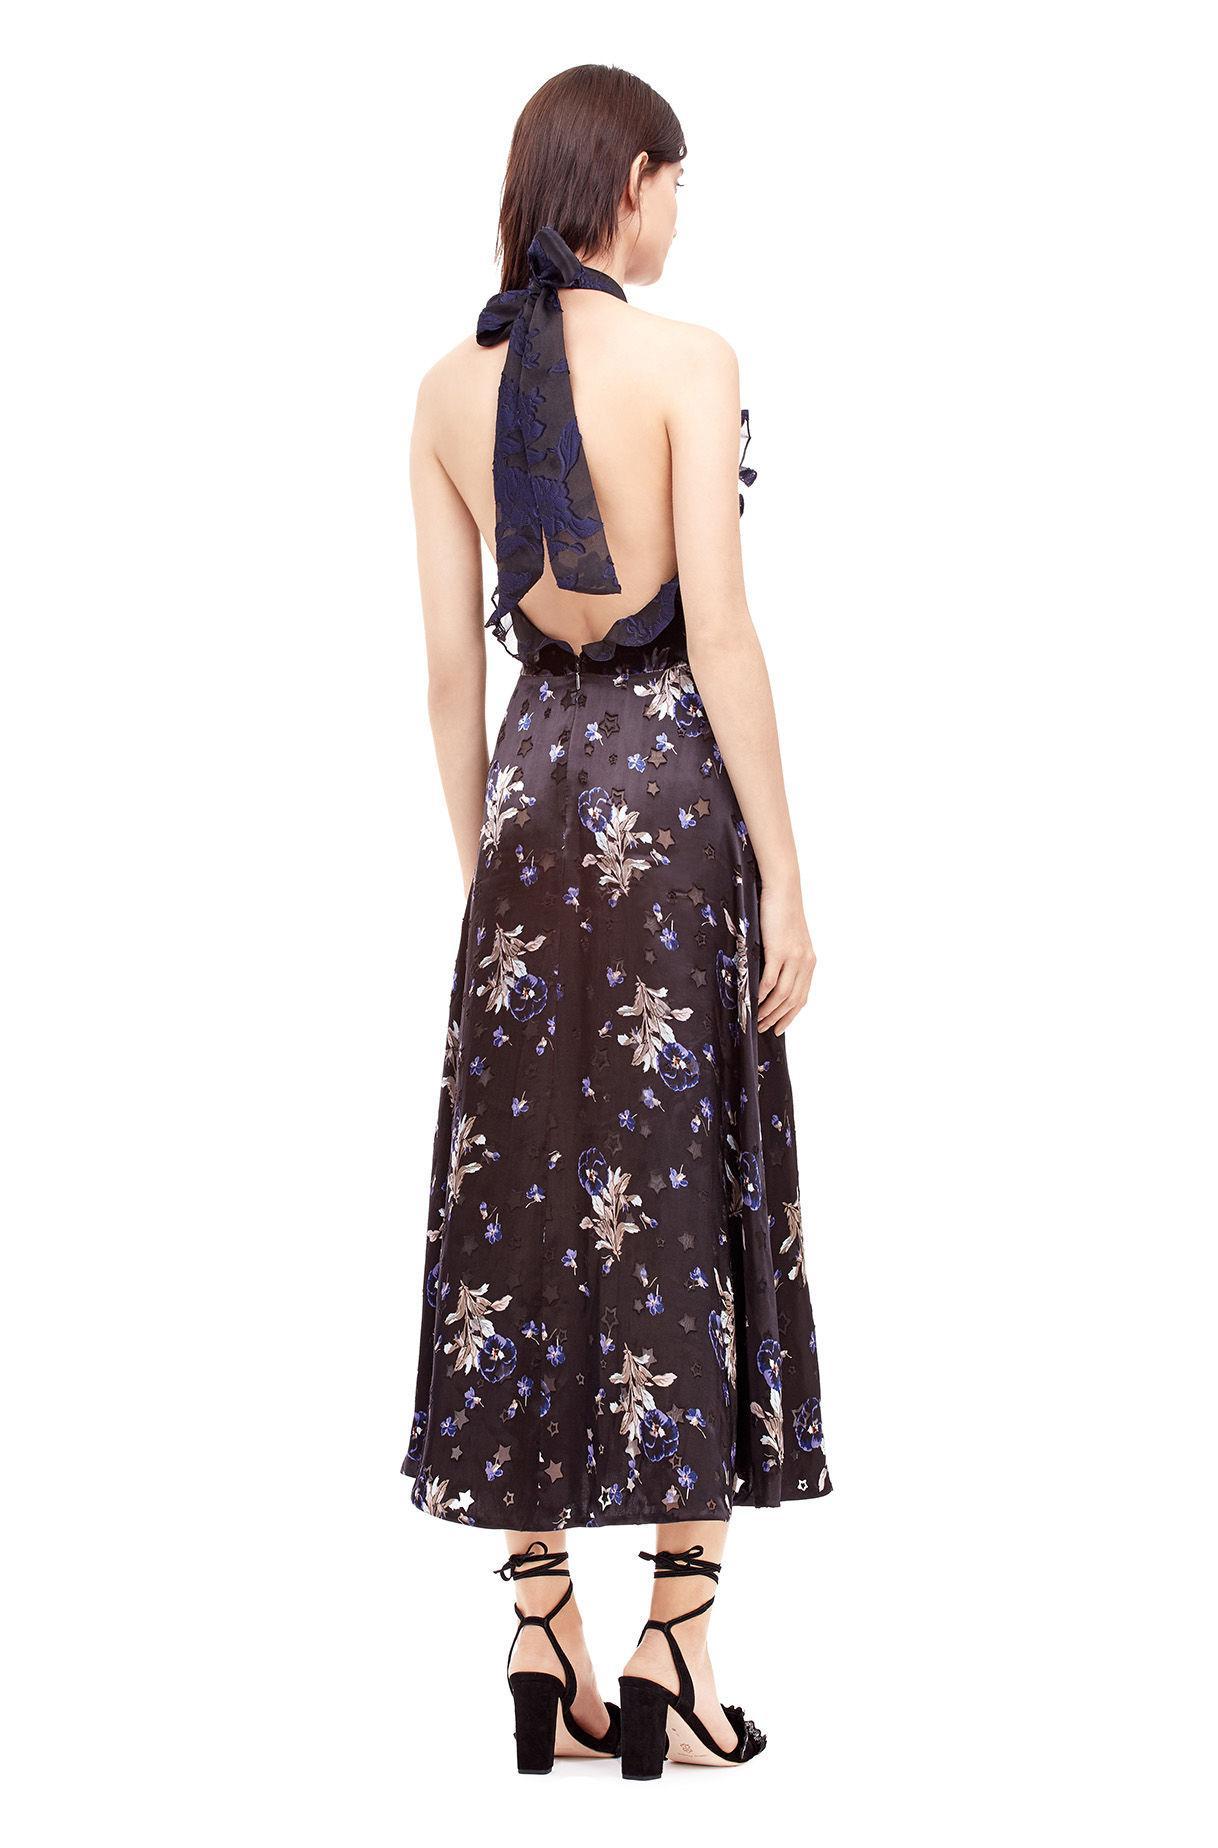 Brown Satin Halter Dress